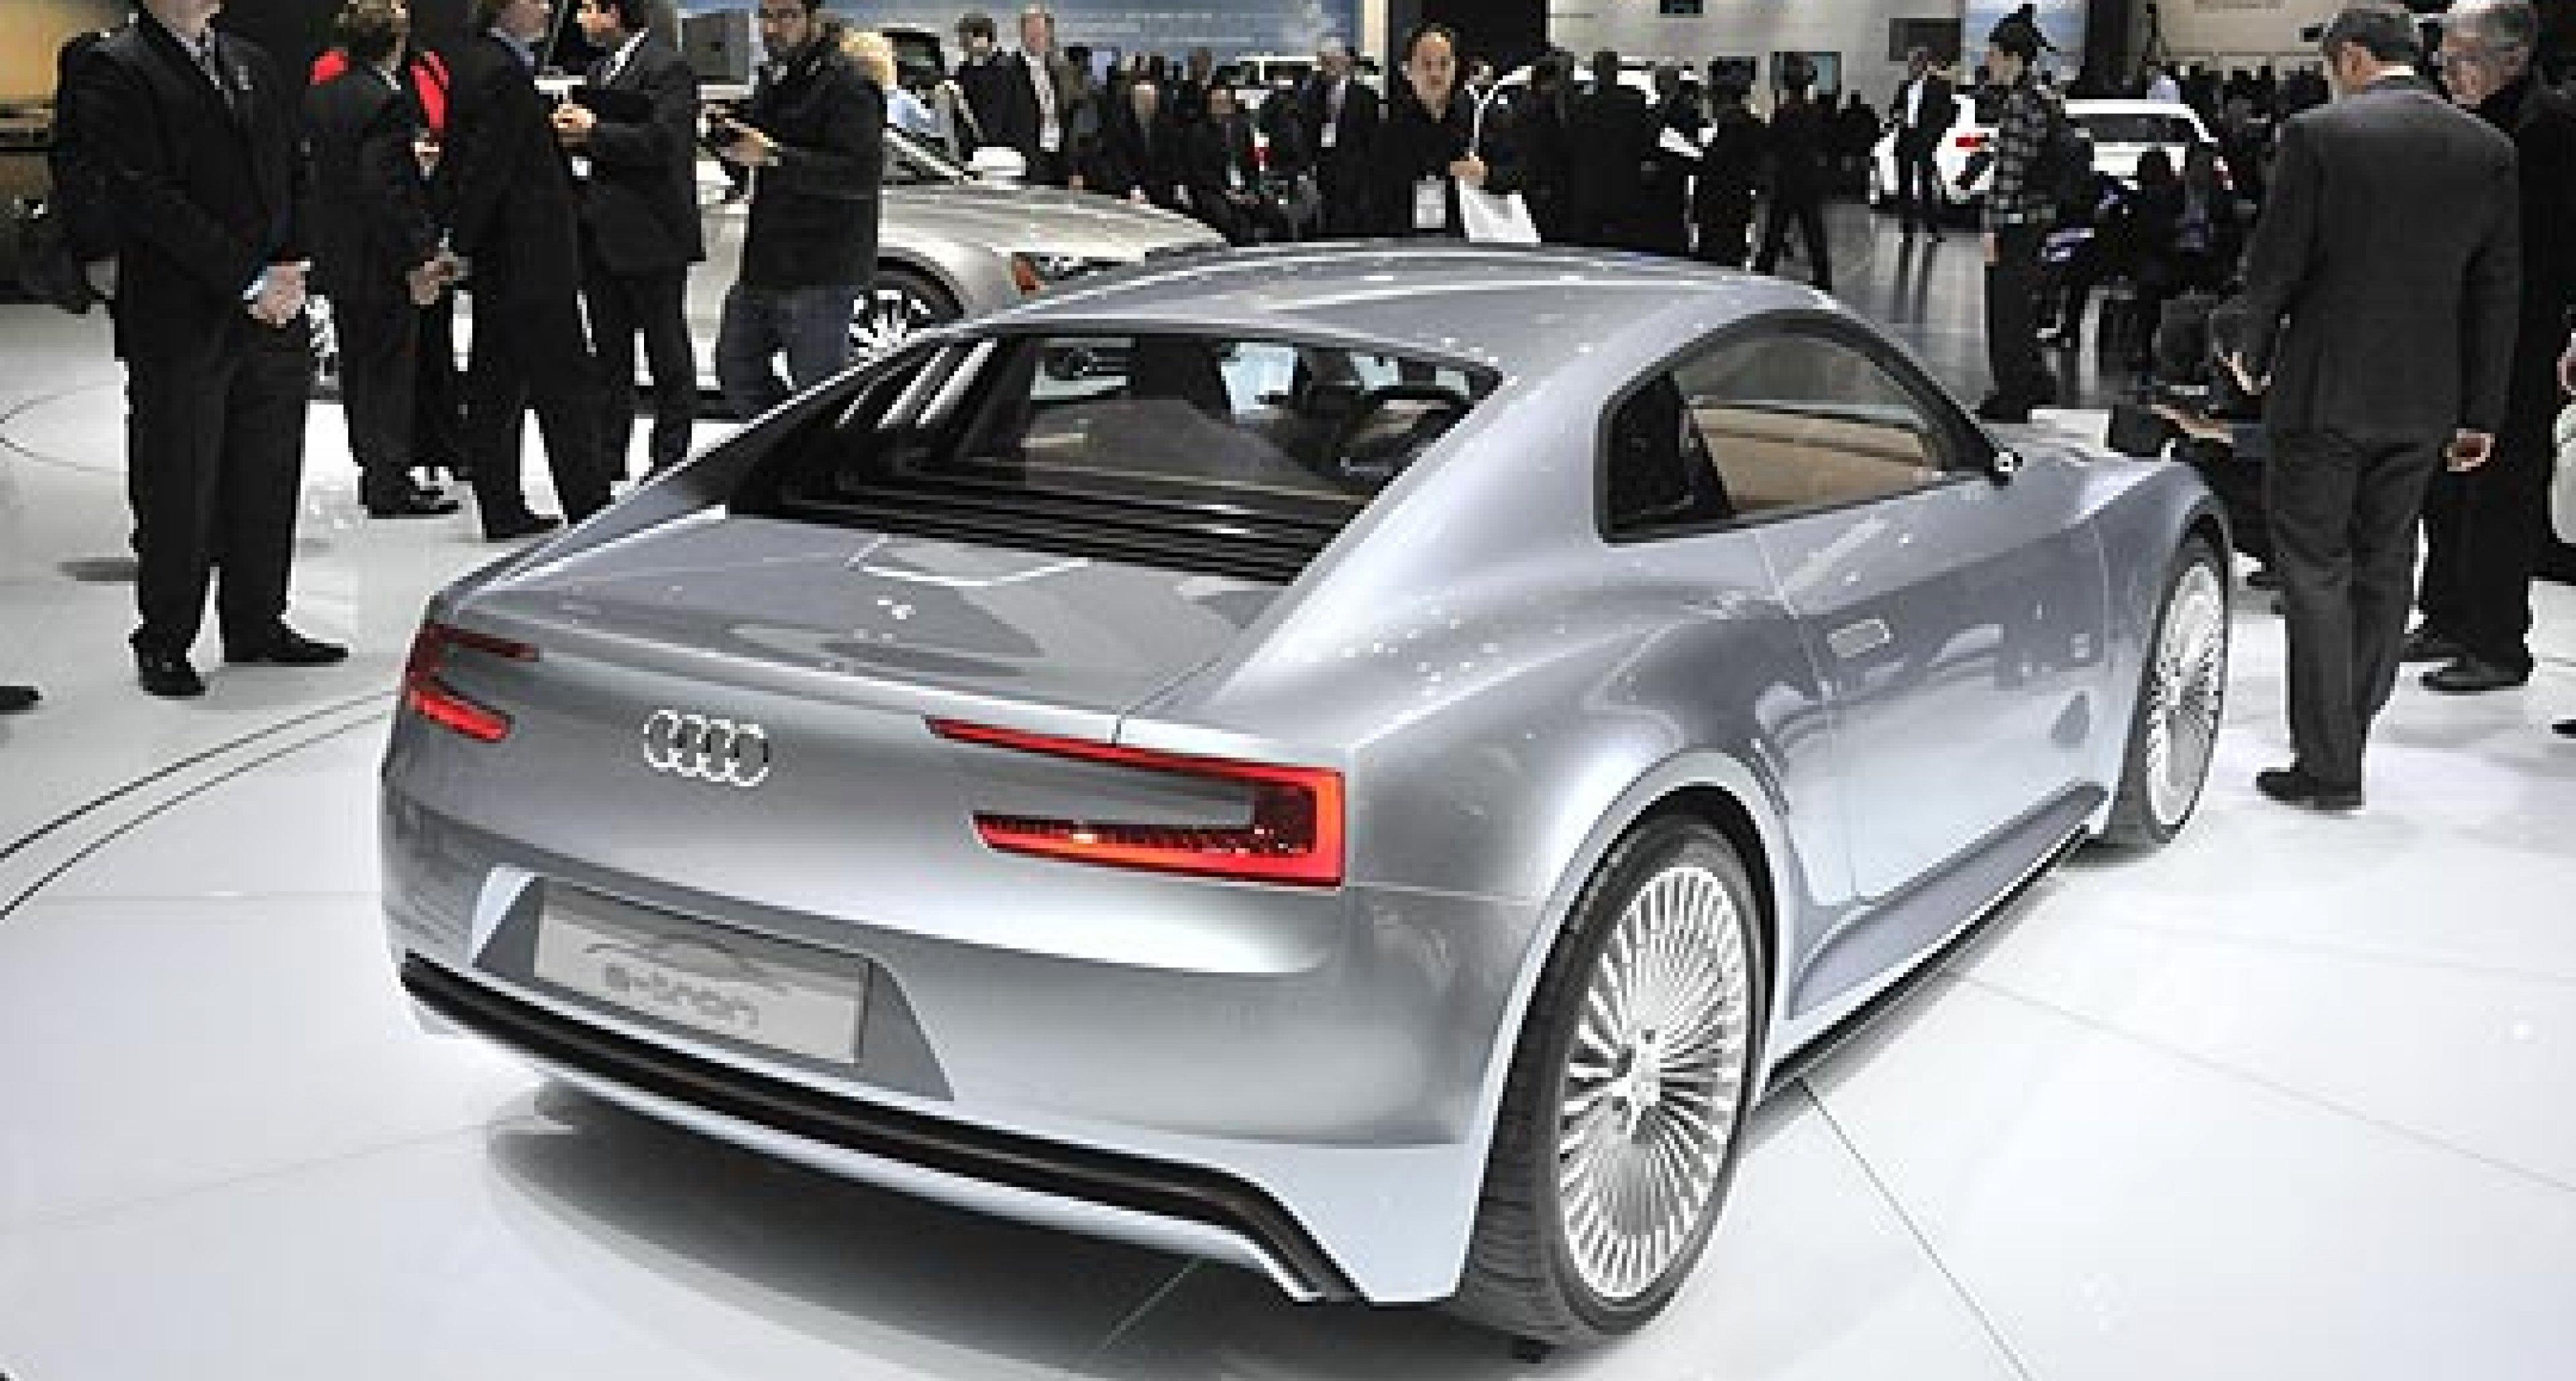 Audi e-tron: New Concept Car Revealed in Detroit